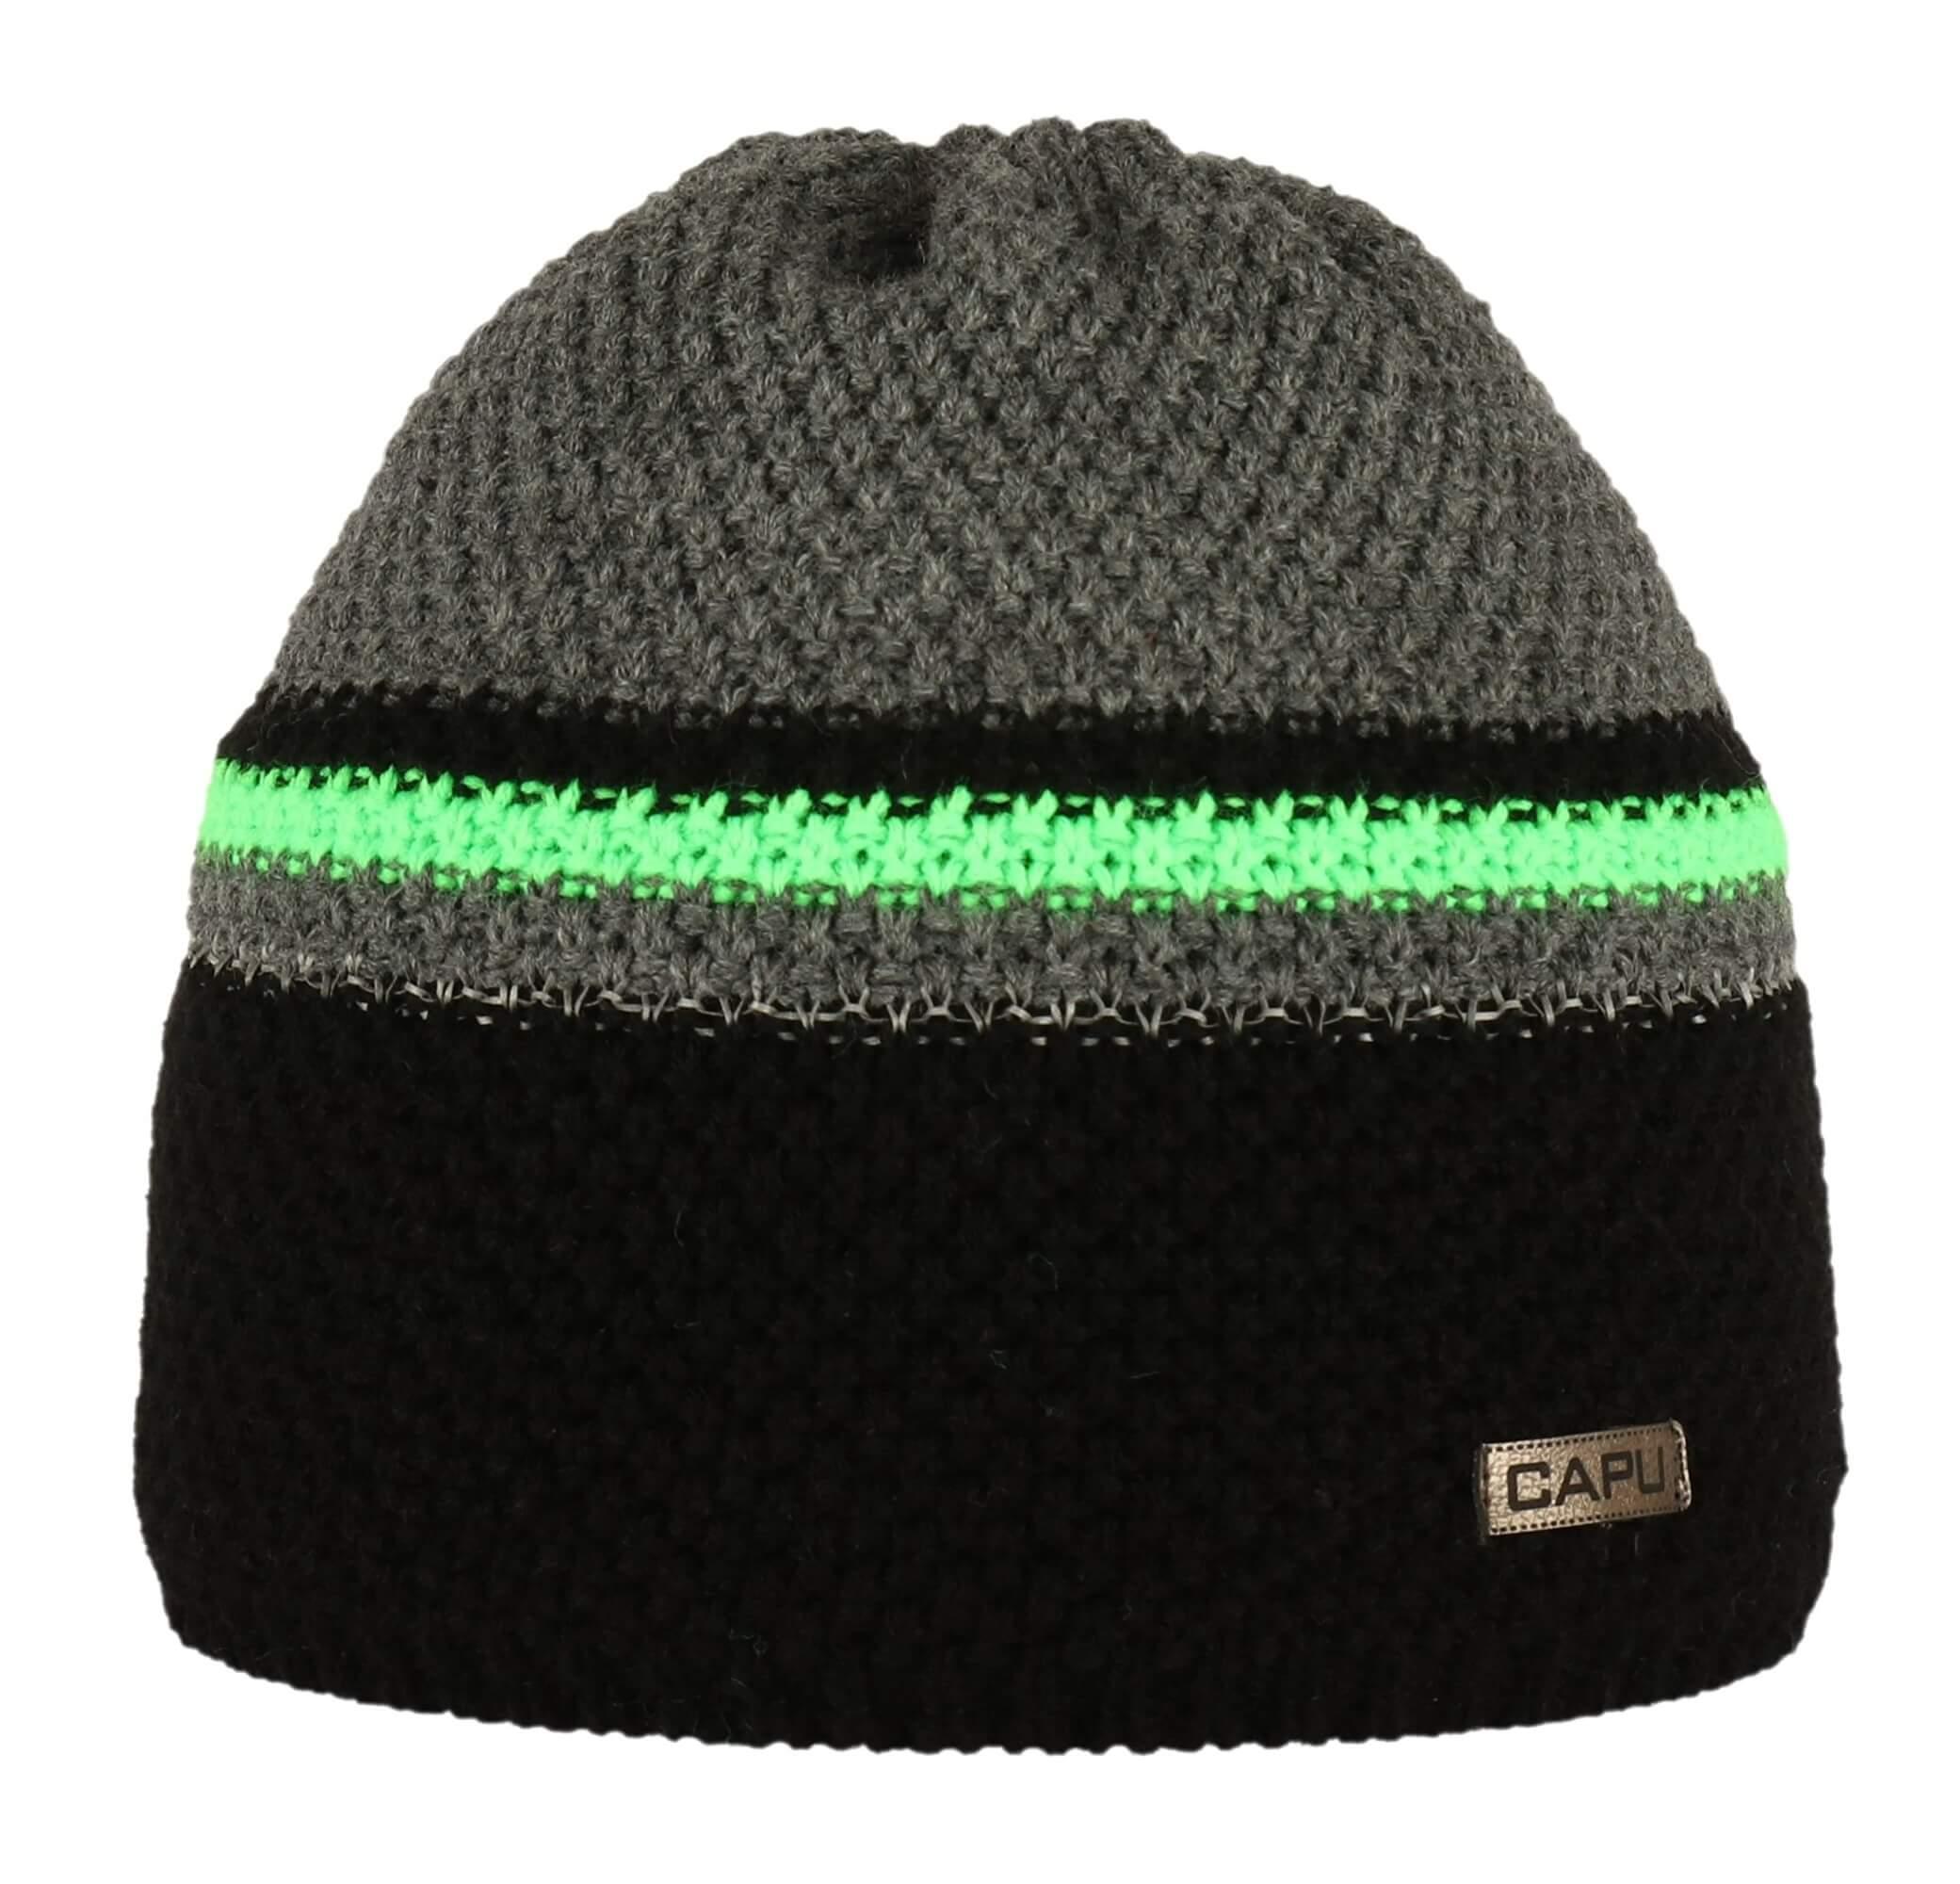 CAPU Téli kalap 678-C Green  d8ebefd200